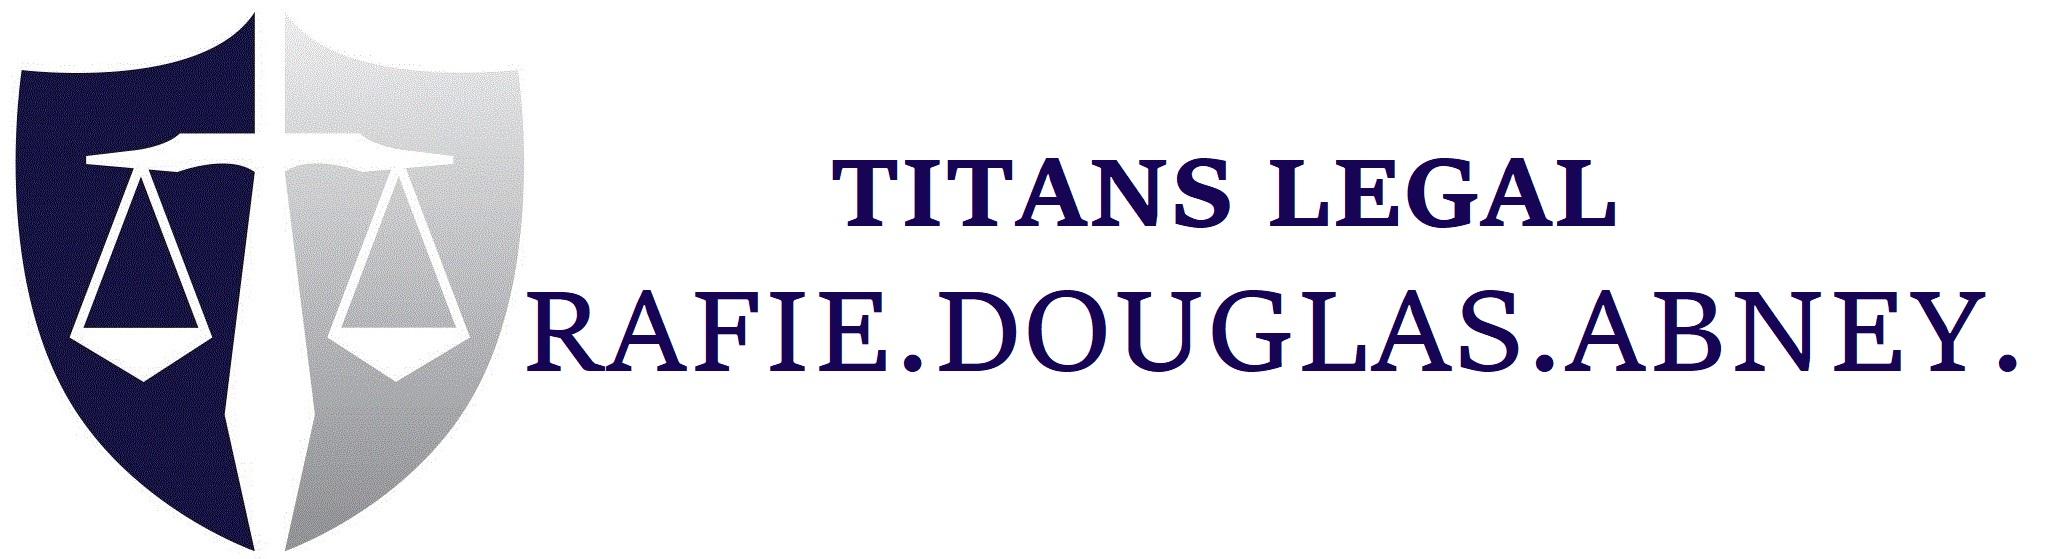 Titans Legal Dallas Texas Law Firm